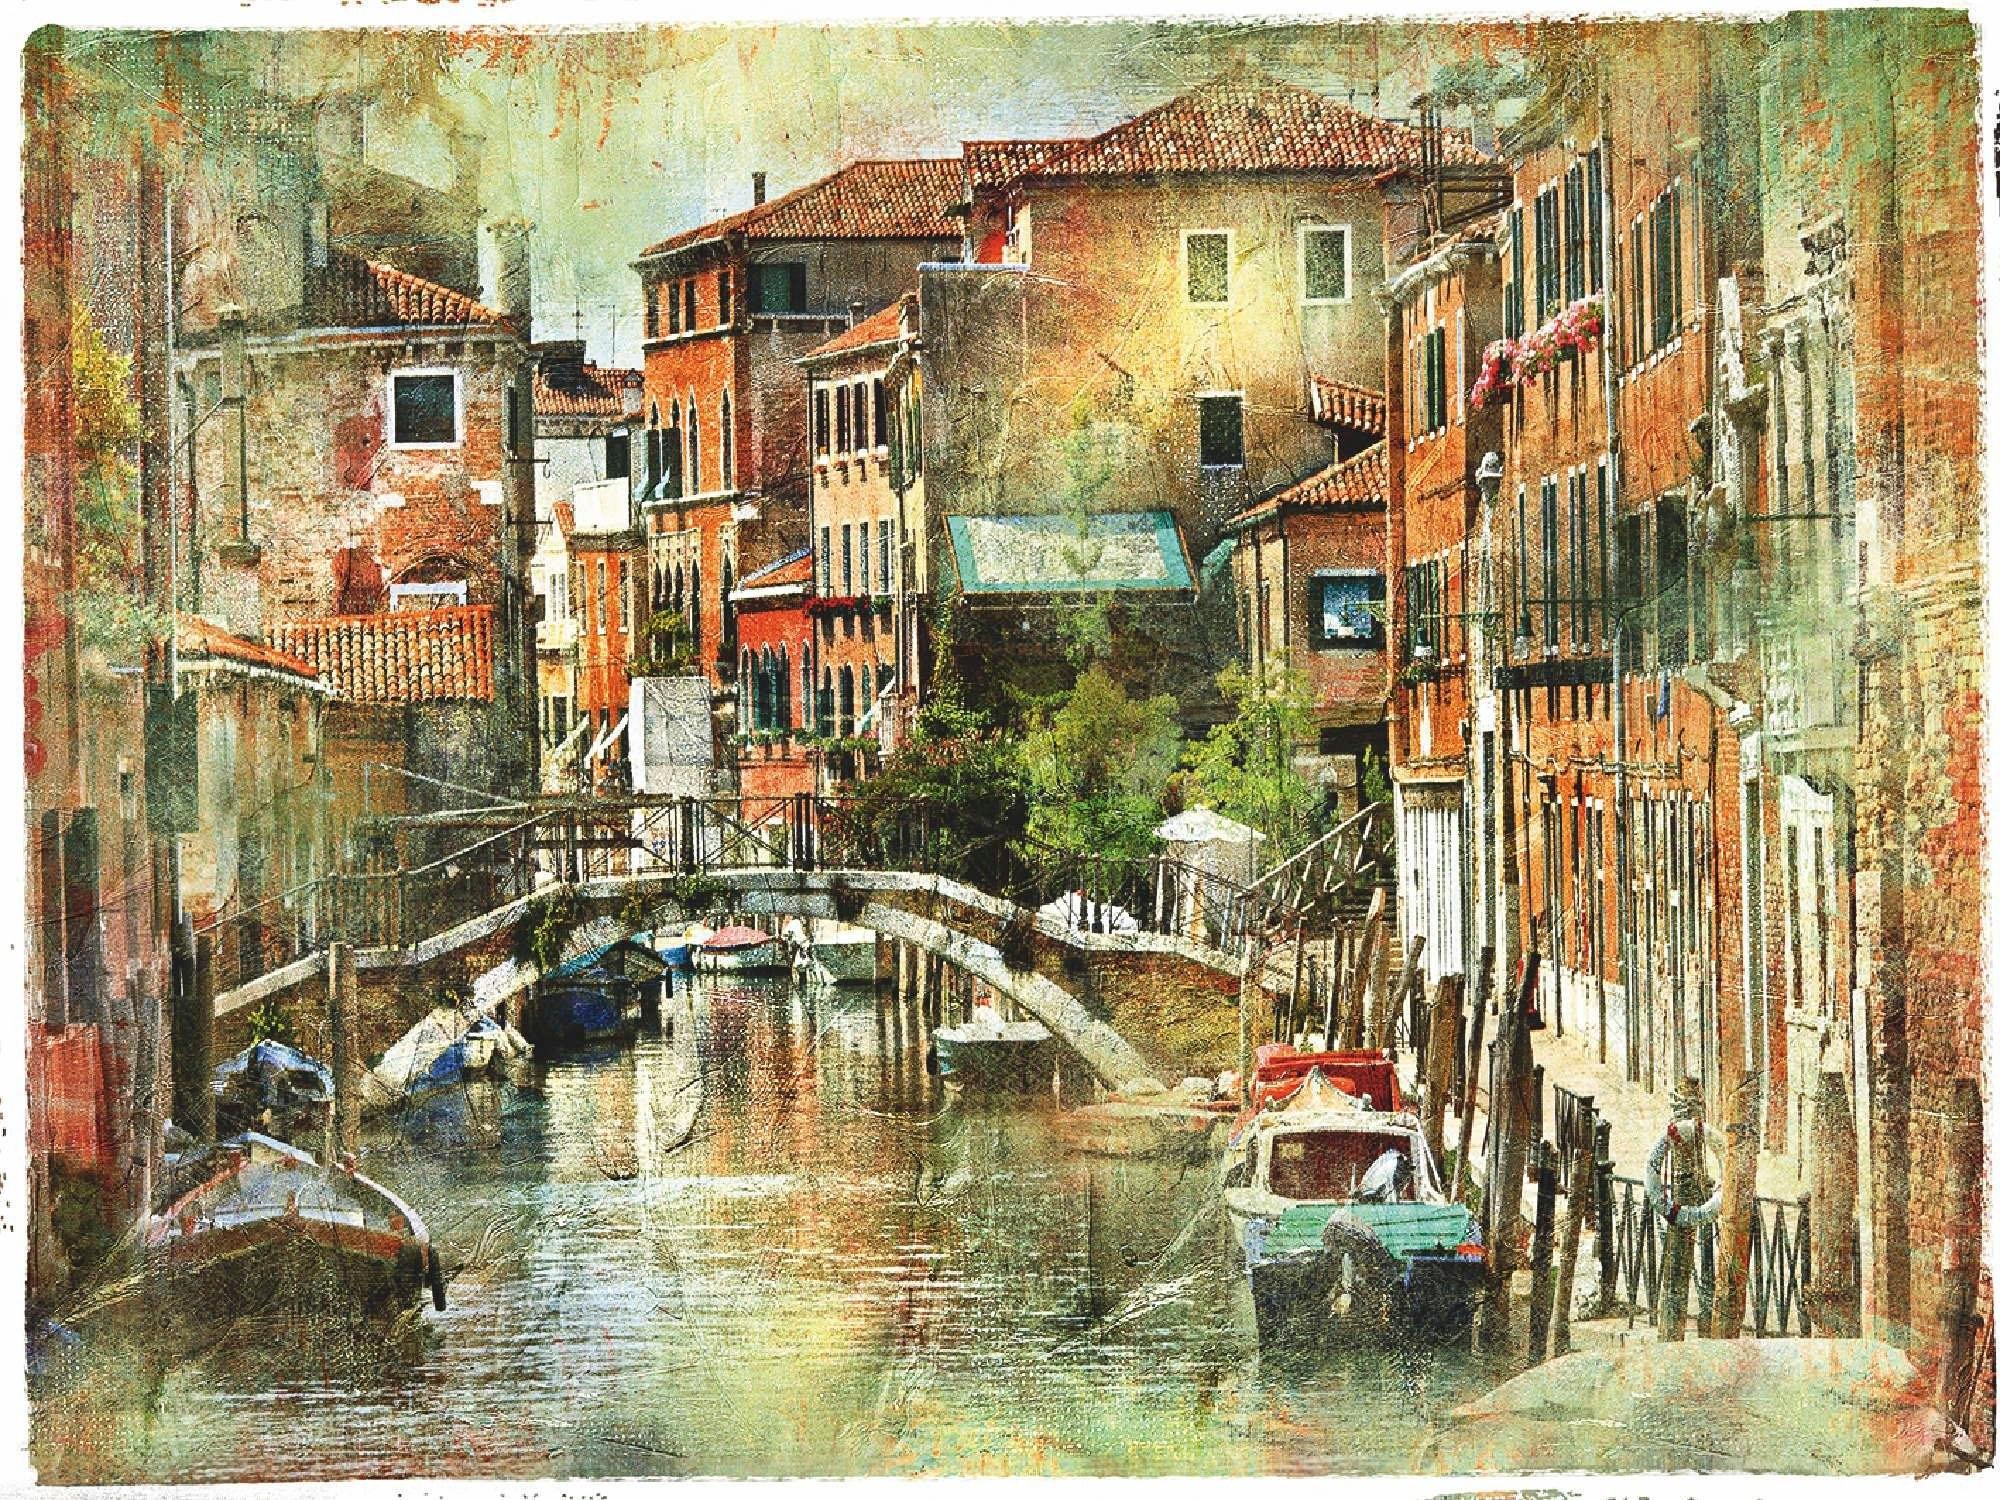 Home Affaire artprint op linnen »Venedig, künstlerische Darstellung im Malstil« bestellen: 30 dagen bedenktijd